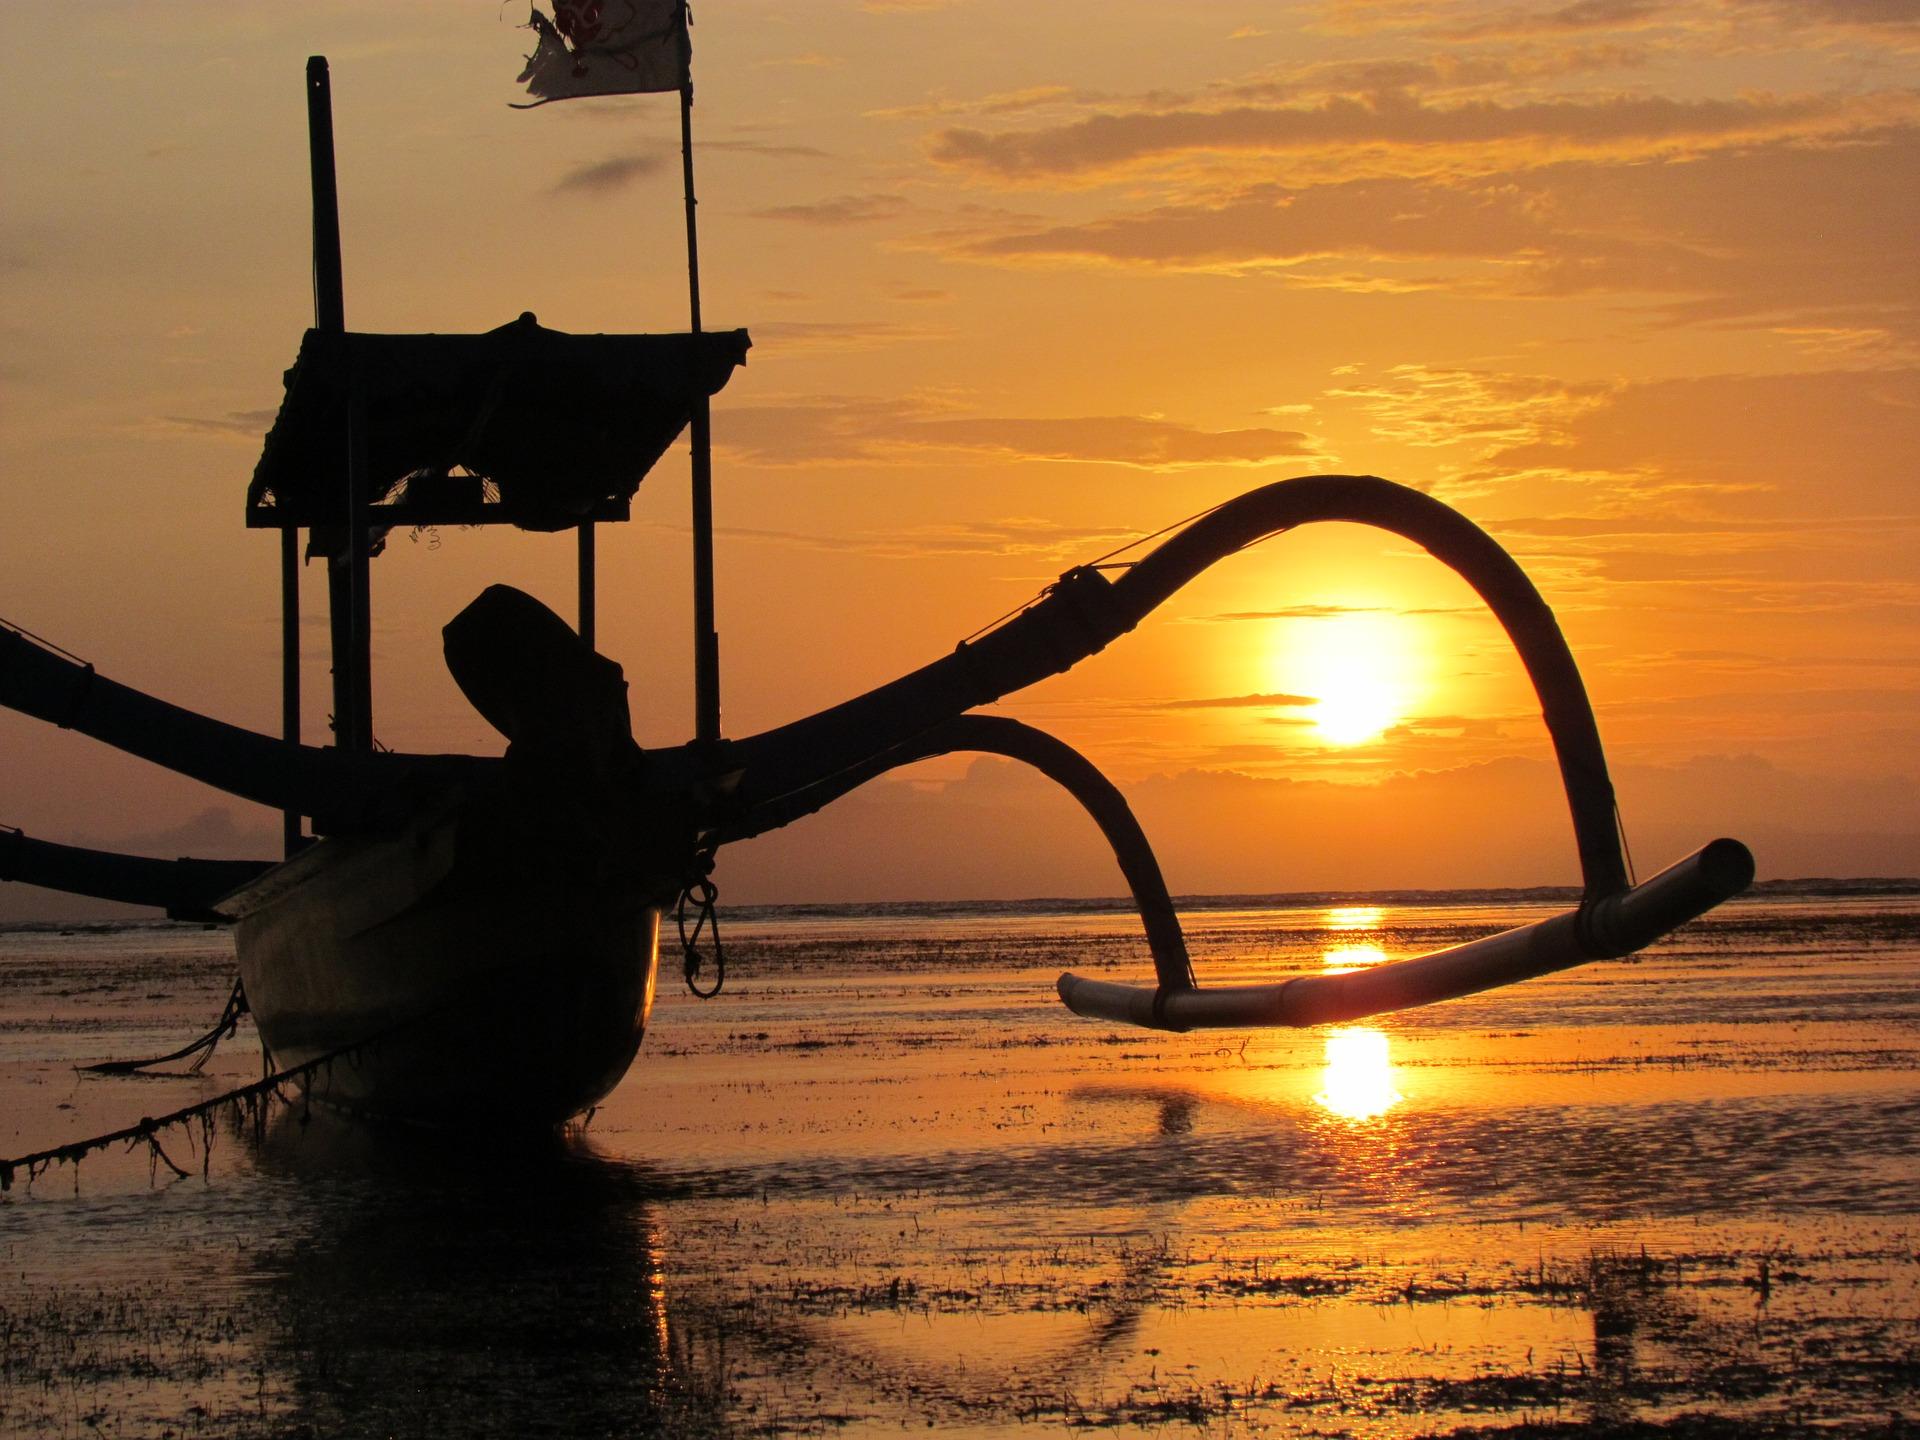 Sunrise in Sanur, Bali, Indonesia